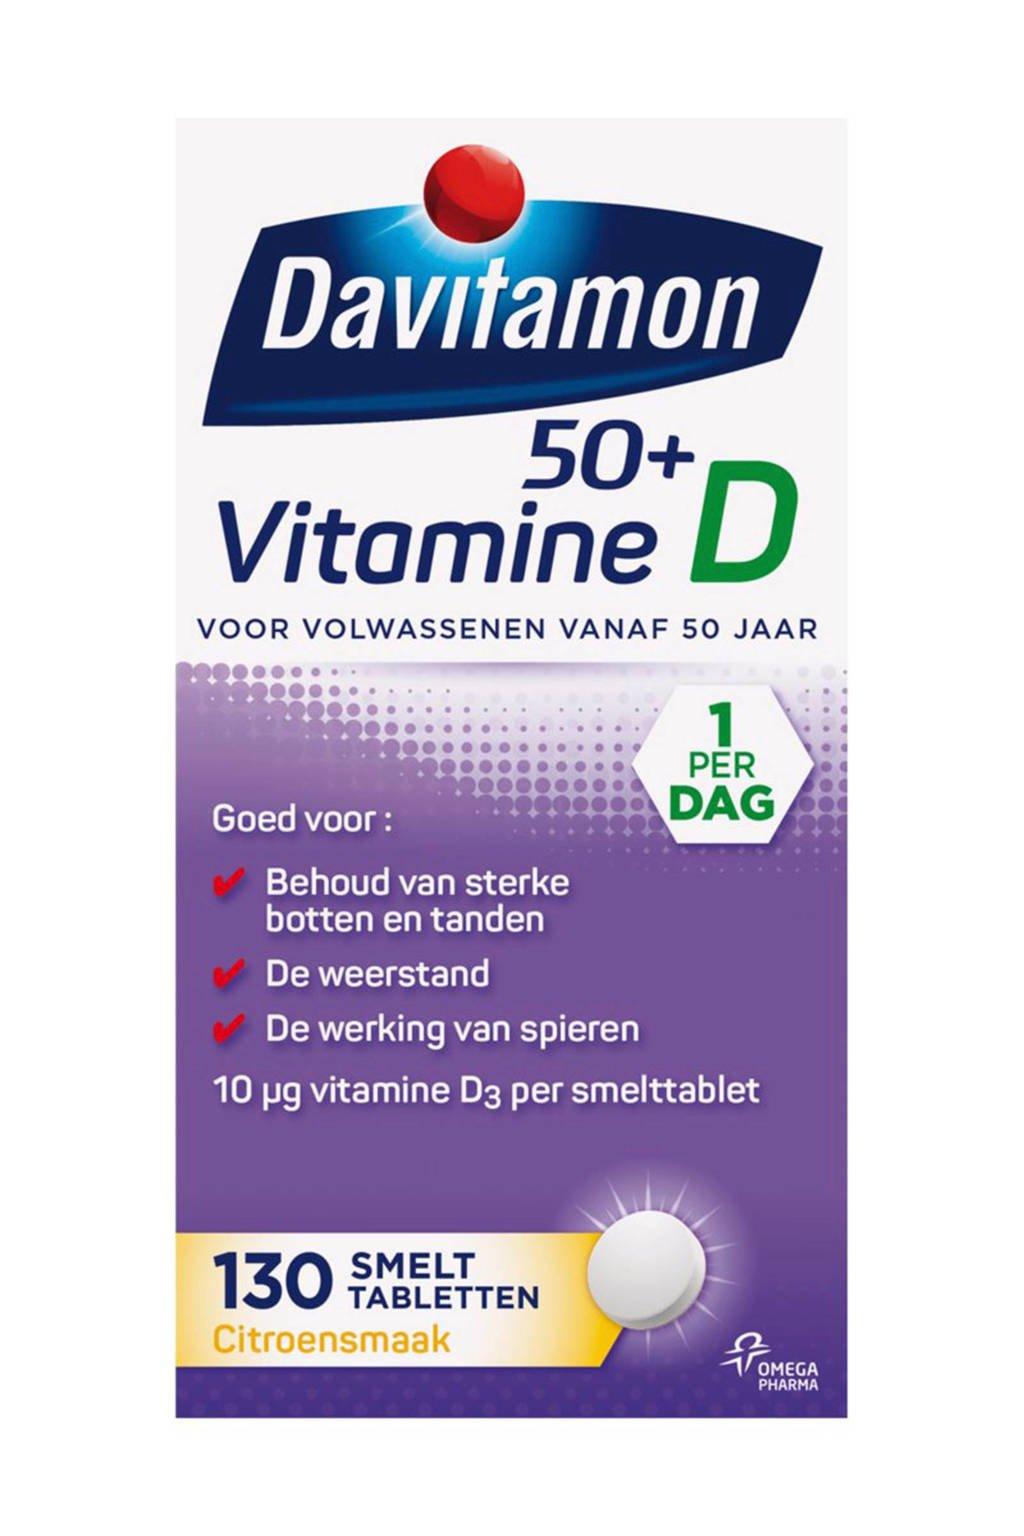 Davitamon Vitamine D 50+ Smelttablet - 130 tabletten